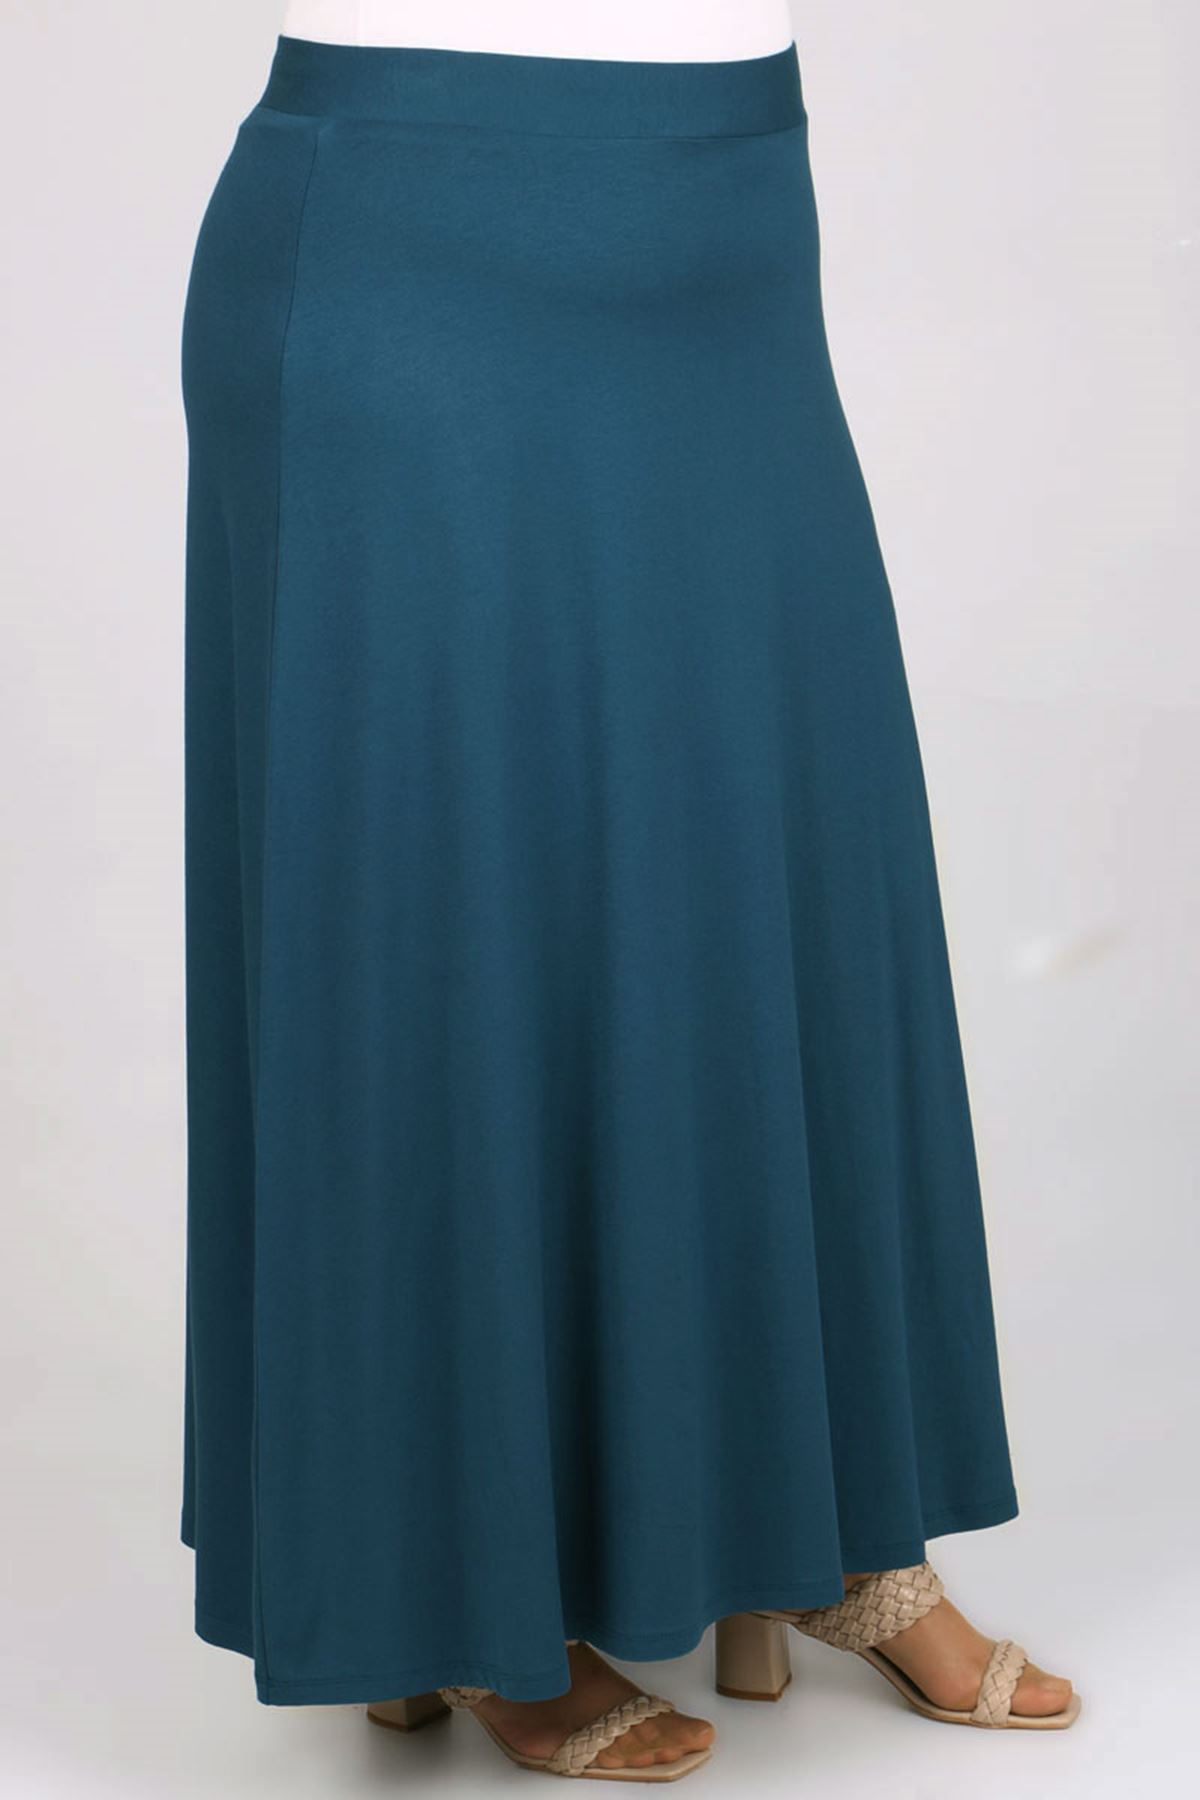 5031 Plus Size Basic Skirt - Petrol Blue